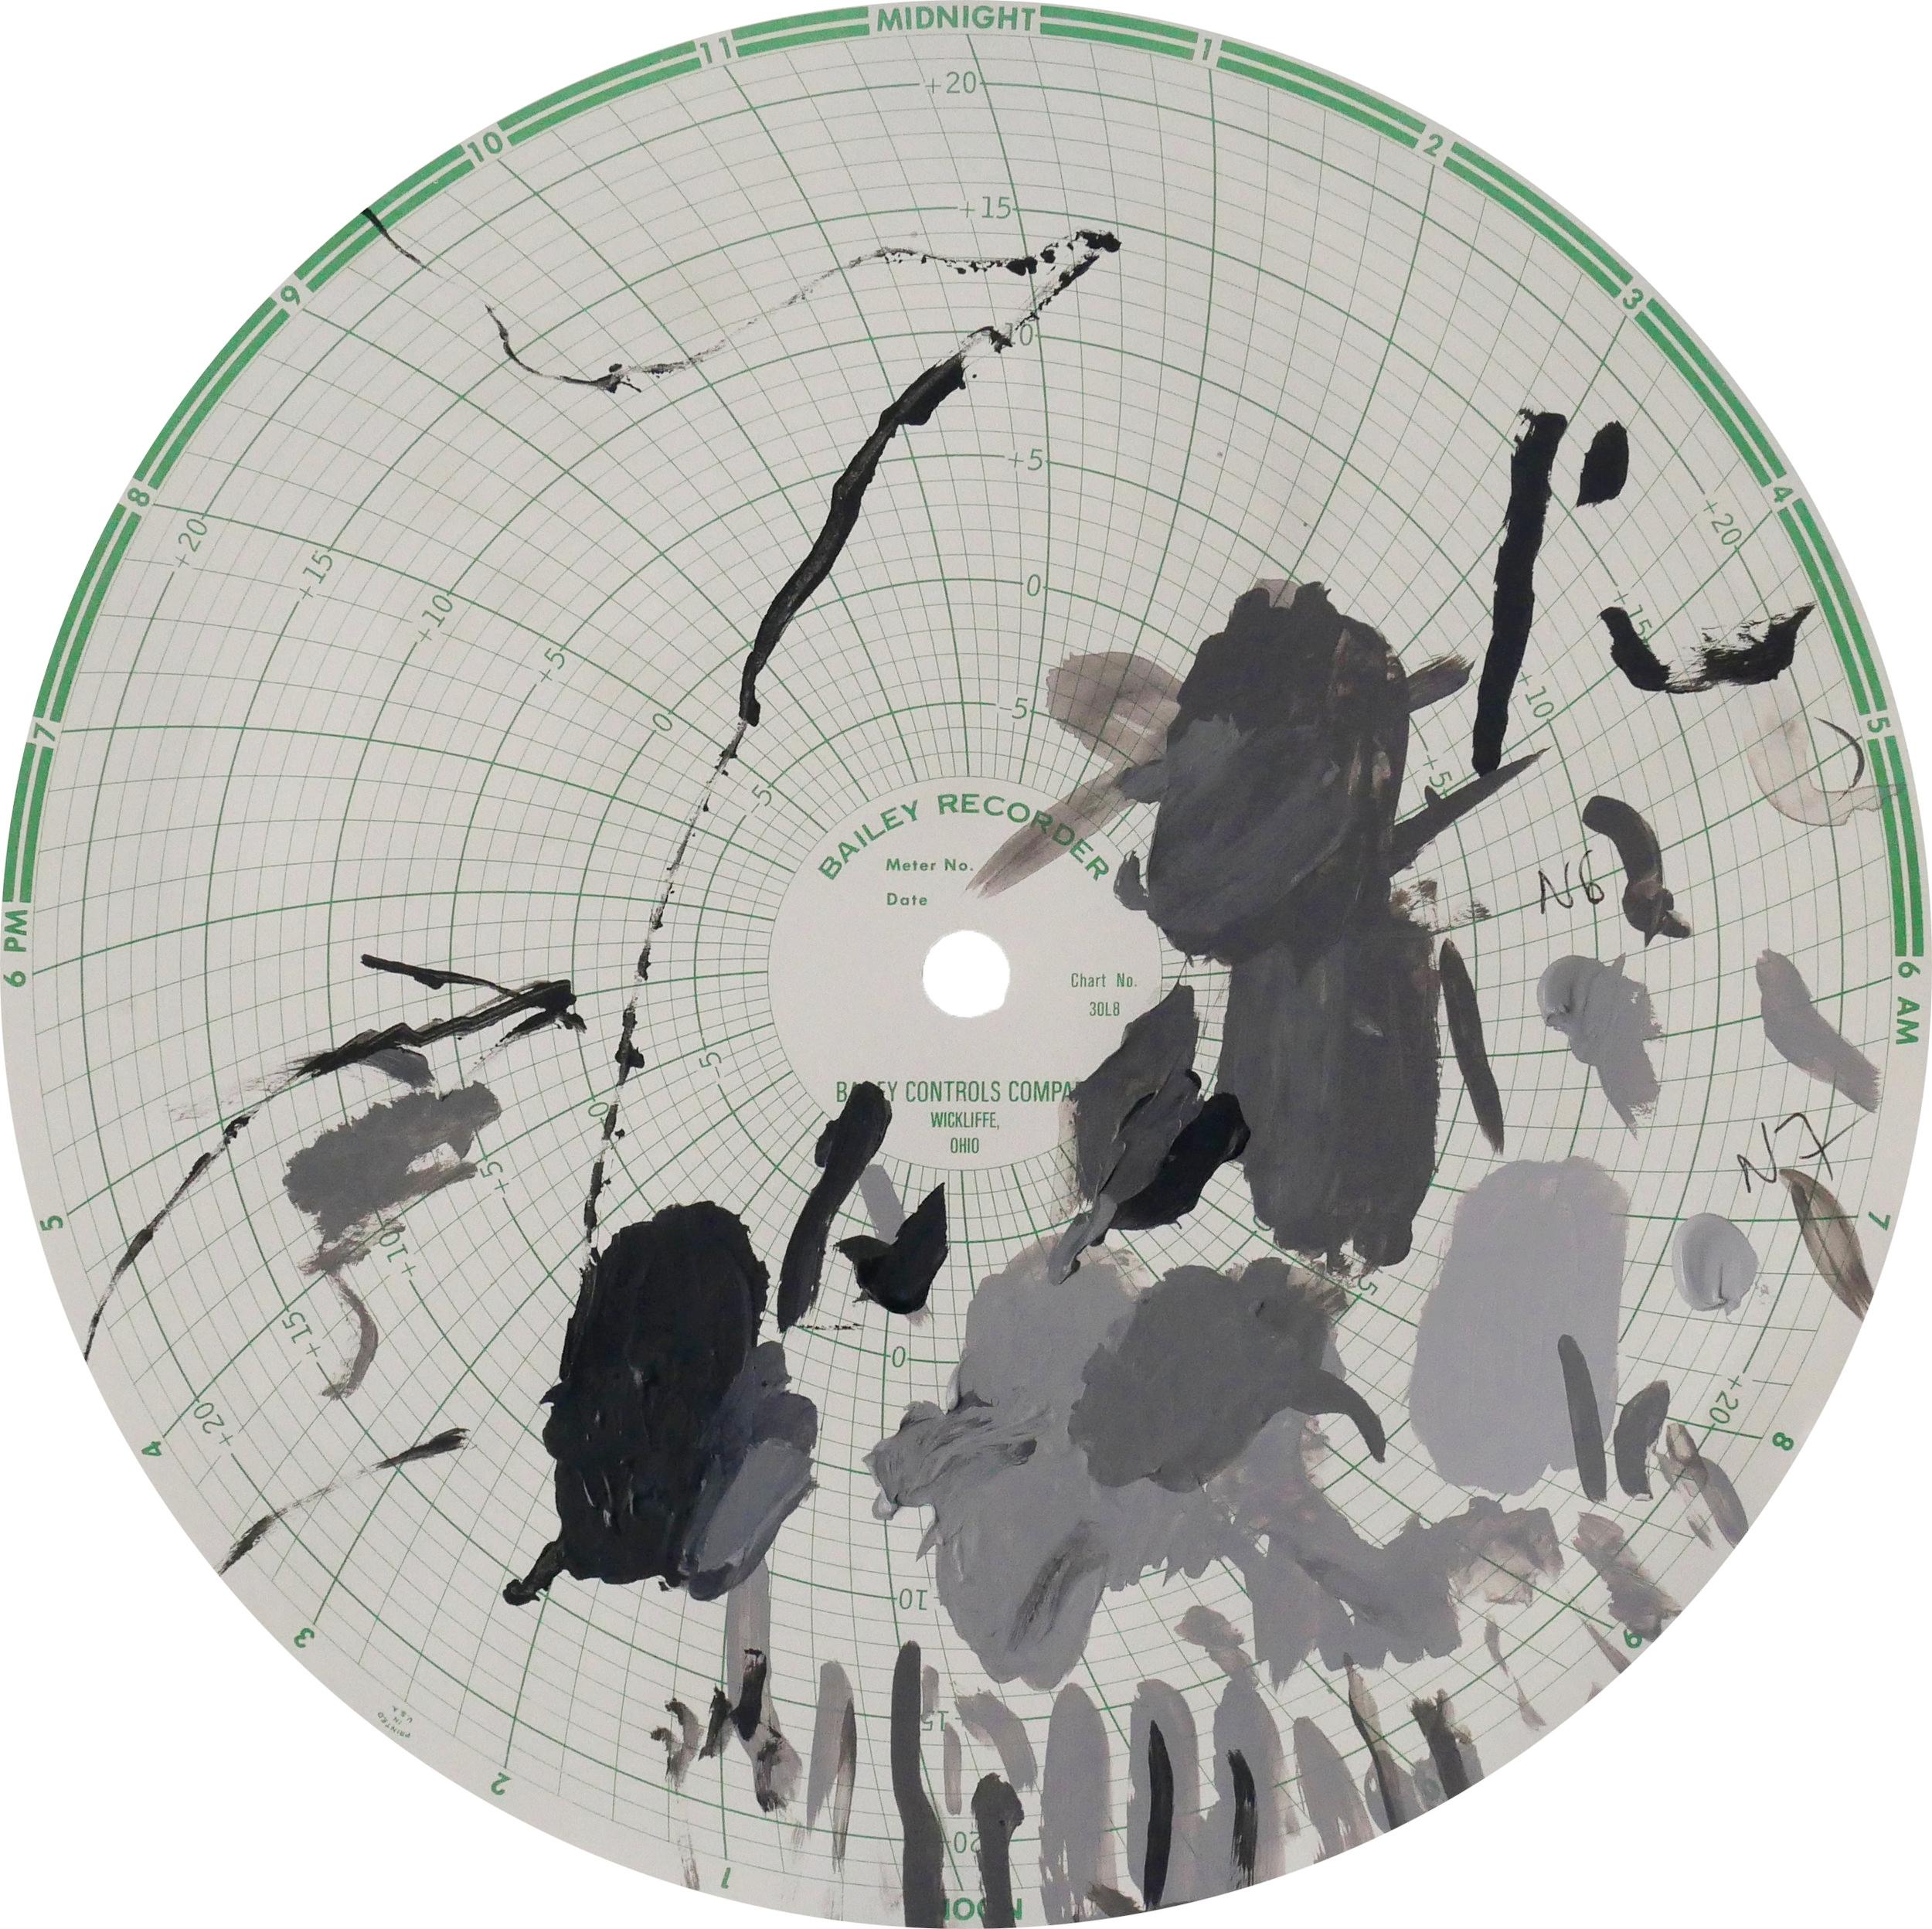 Midnight Recorder (2405)   Acrylic on paper 11.1 in diameter 28.2 cm diameter